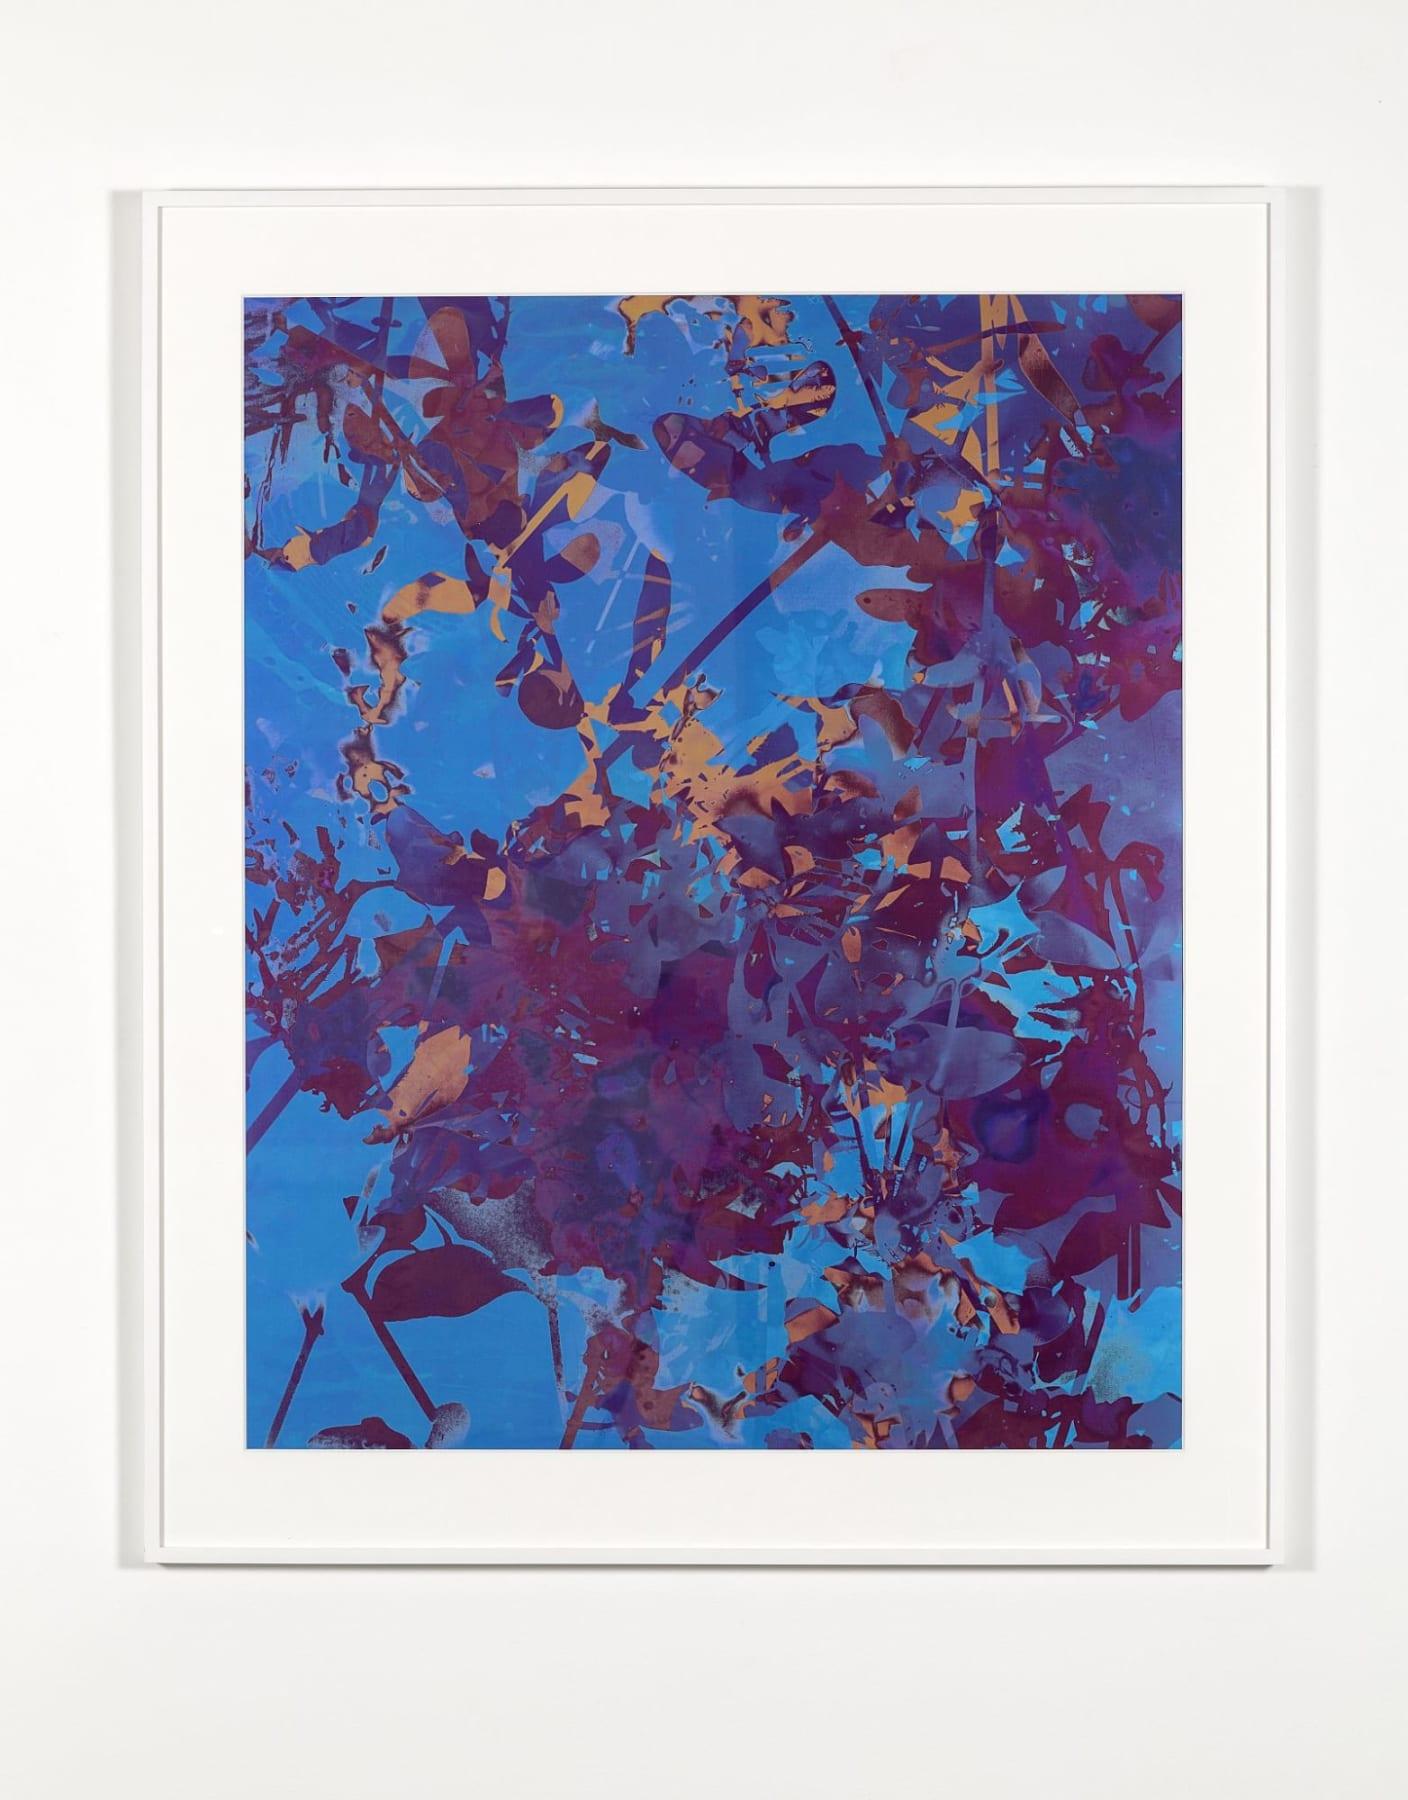 A blue, purple and orange photo collage of overlaid views of foliage.